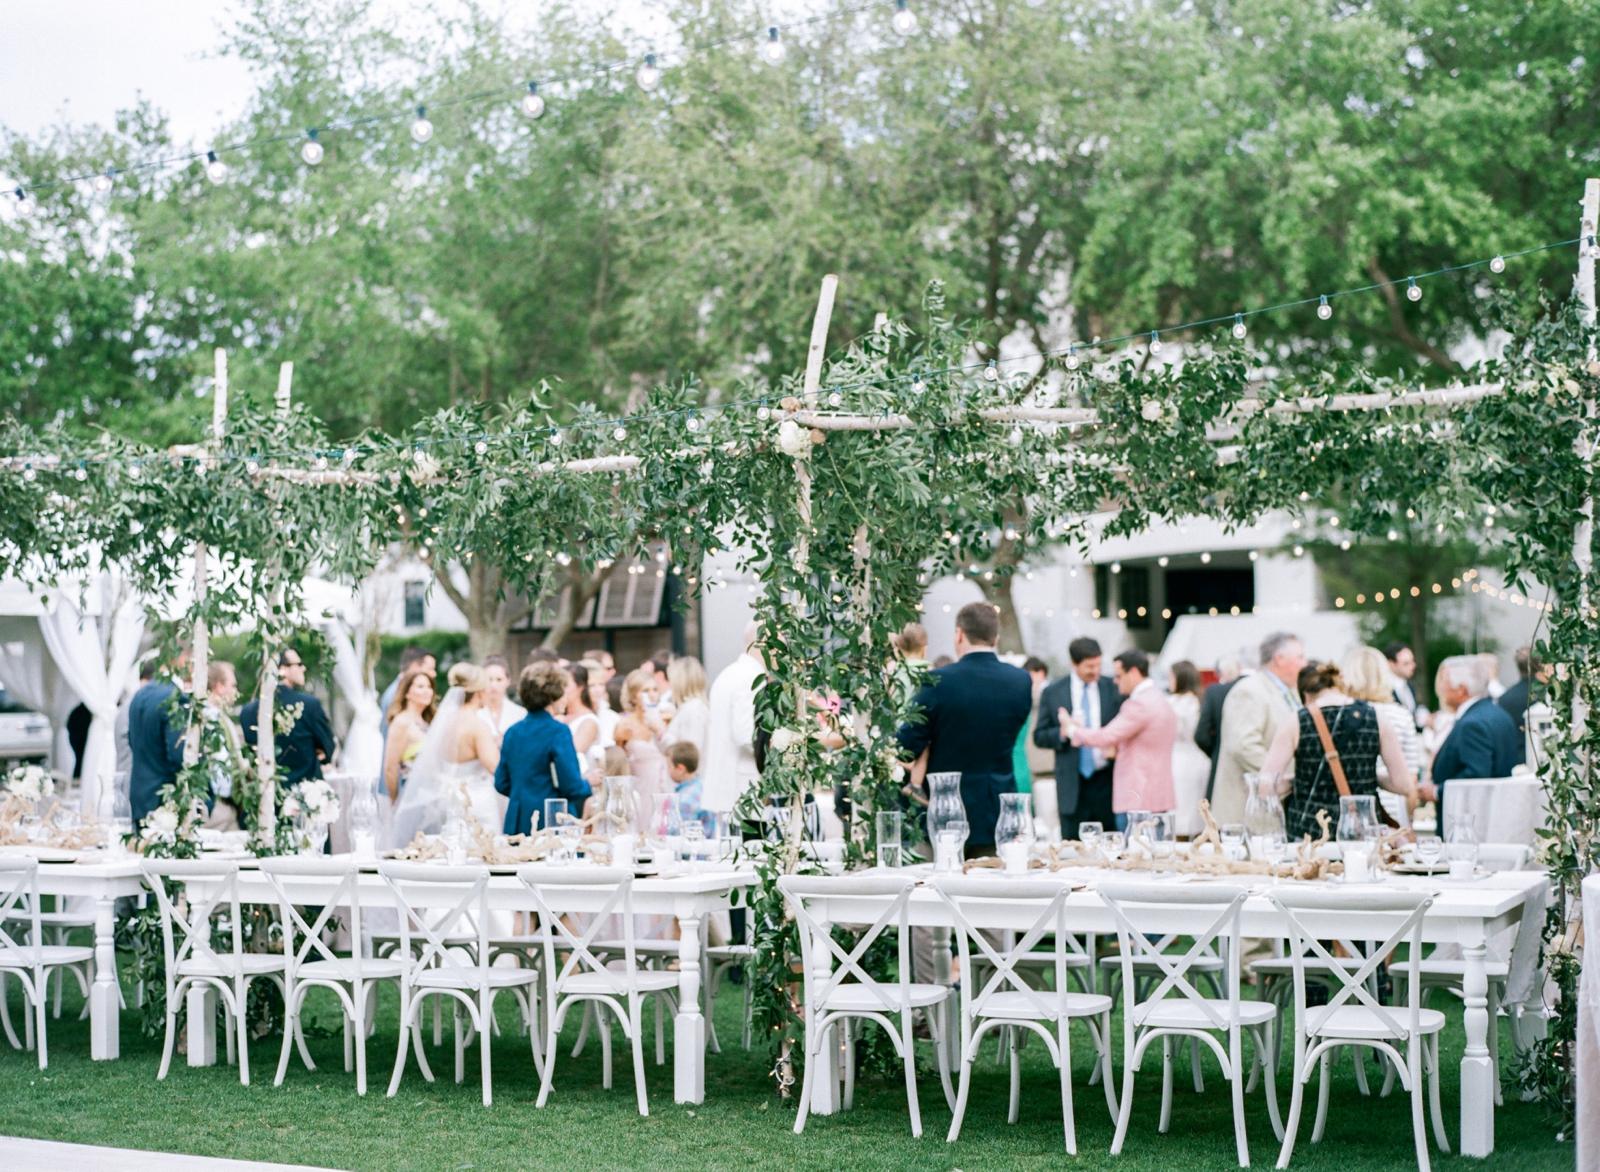 rosemary beach wedding photographer st augustine green rosemary beach shannon griffin_0067.jpg